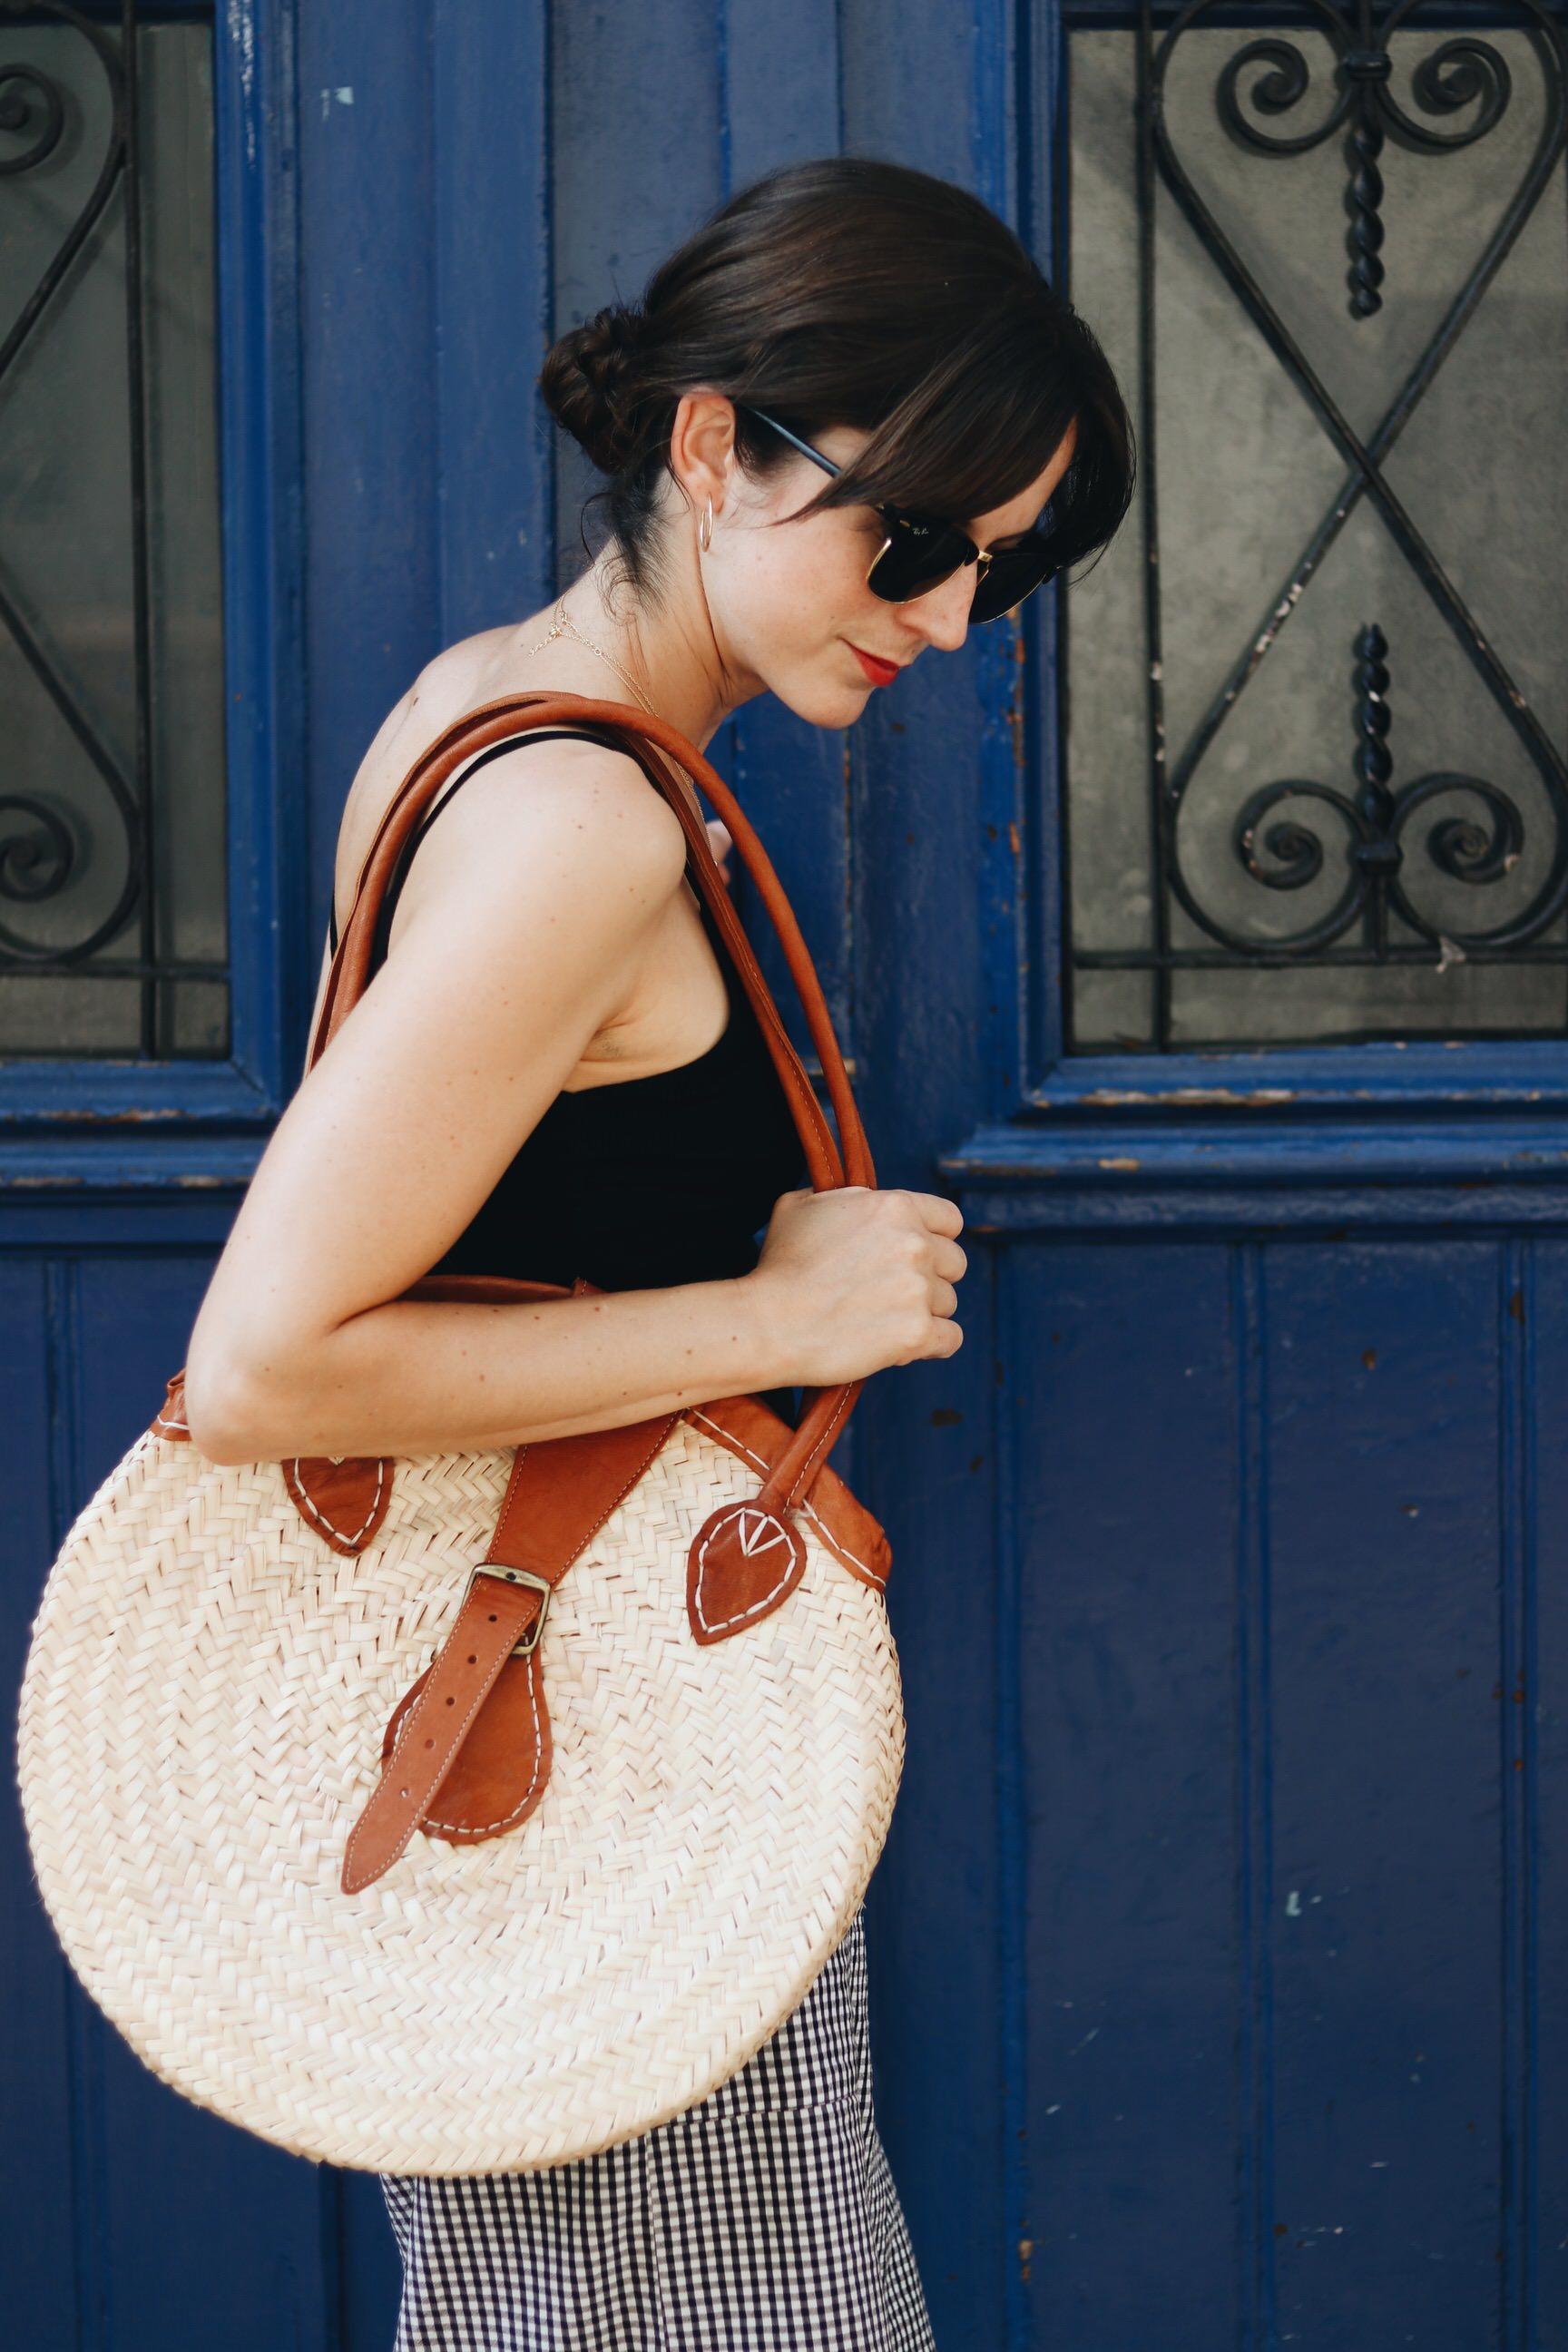 Korbtasche rund Trend Modeblog Outfit Sommer Fashionblog